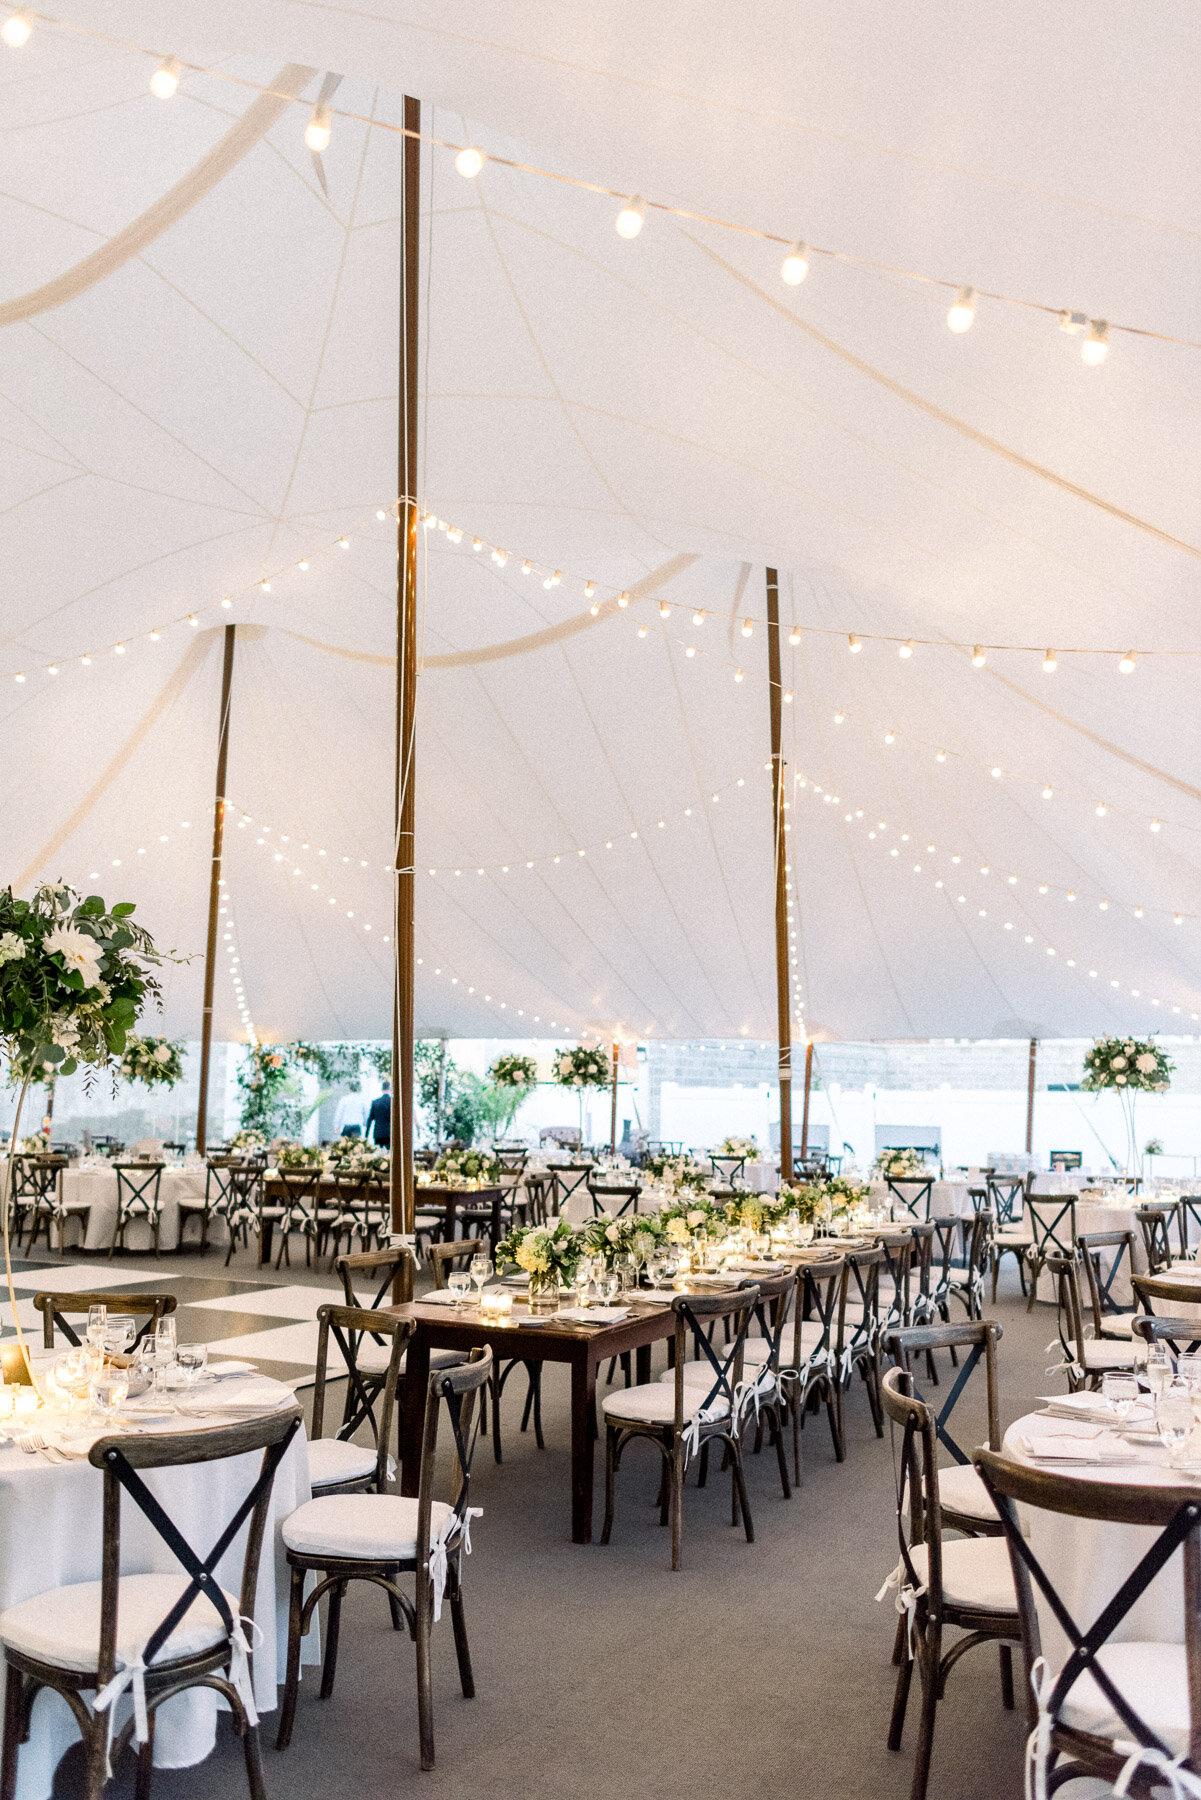 Sailcloth tent Adelphi Hotel Wedding Saratoga Springs NY